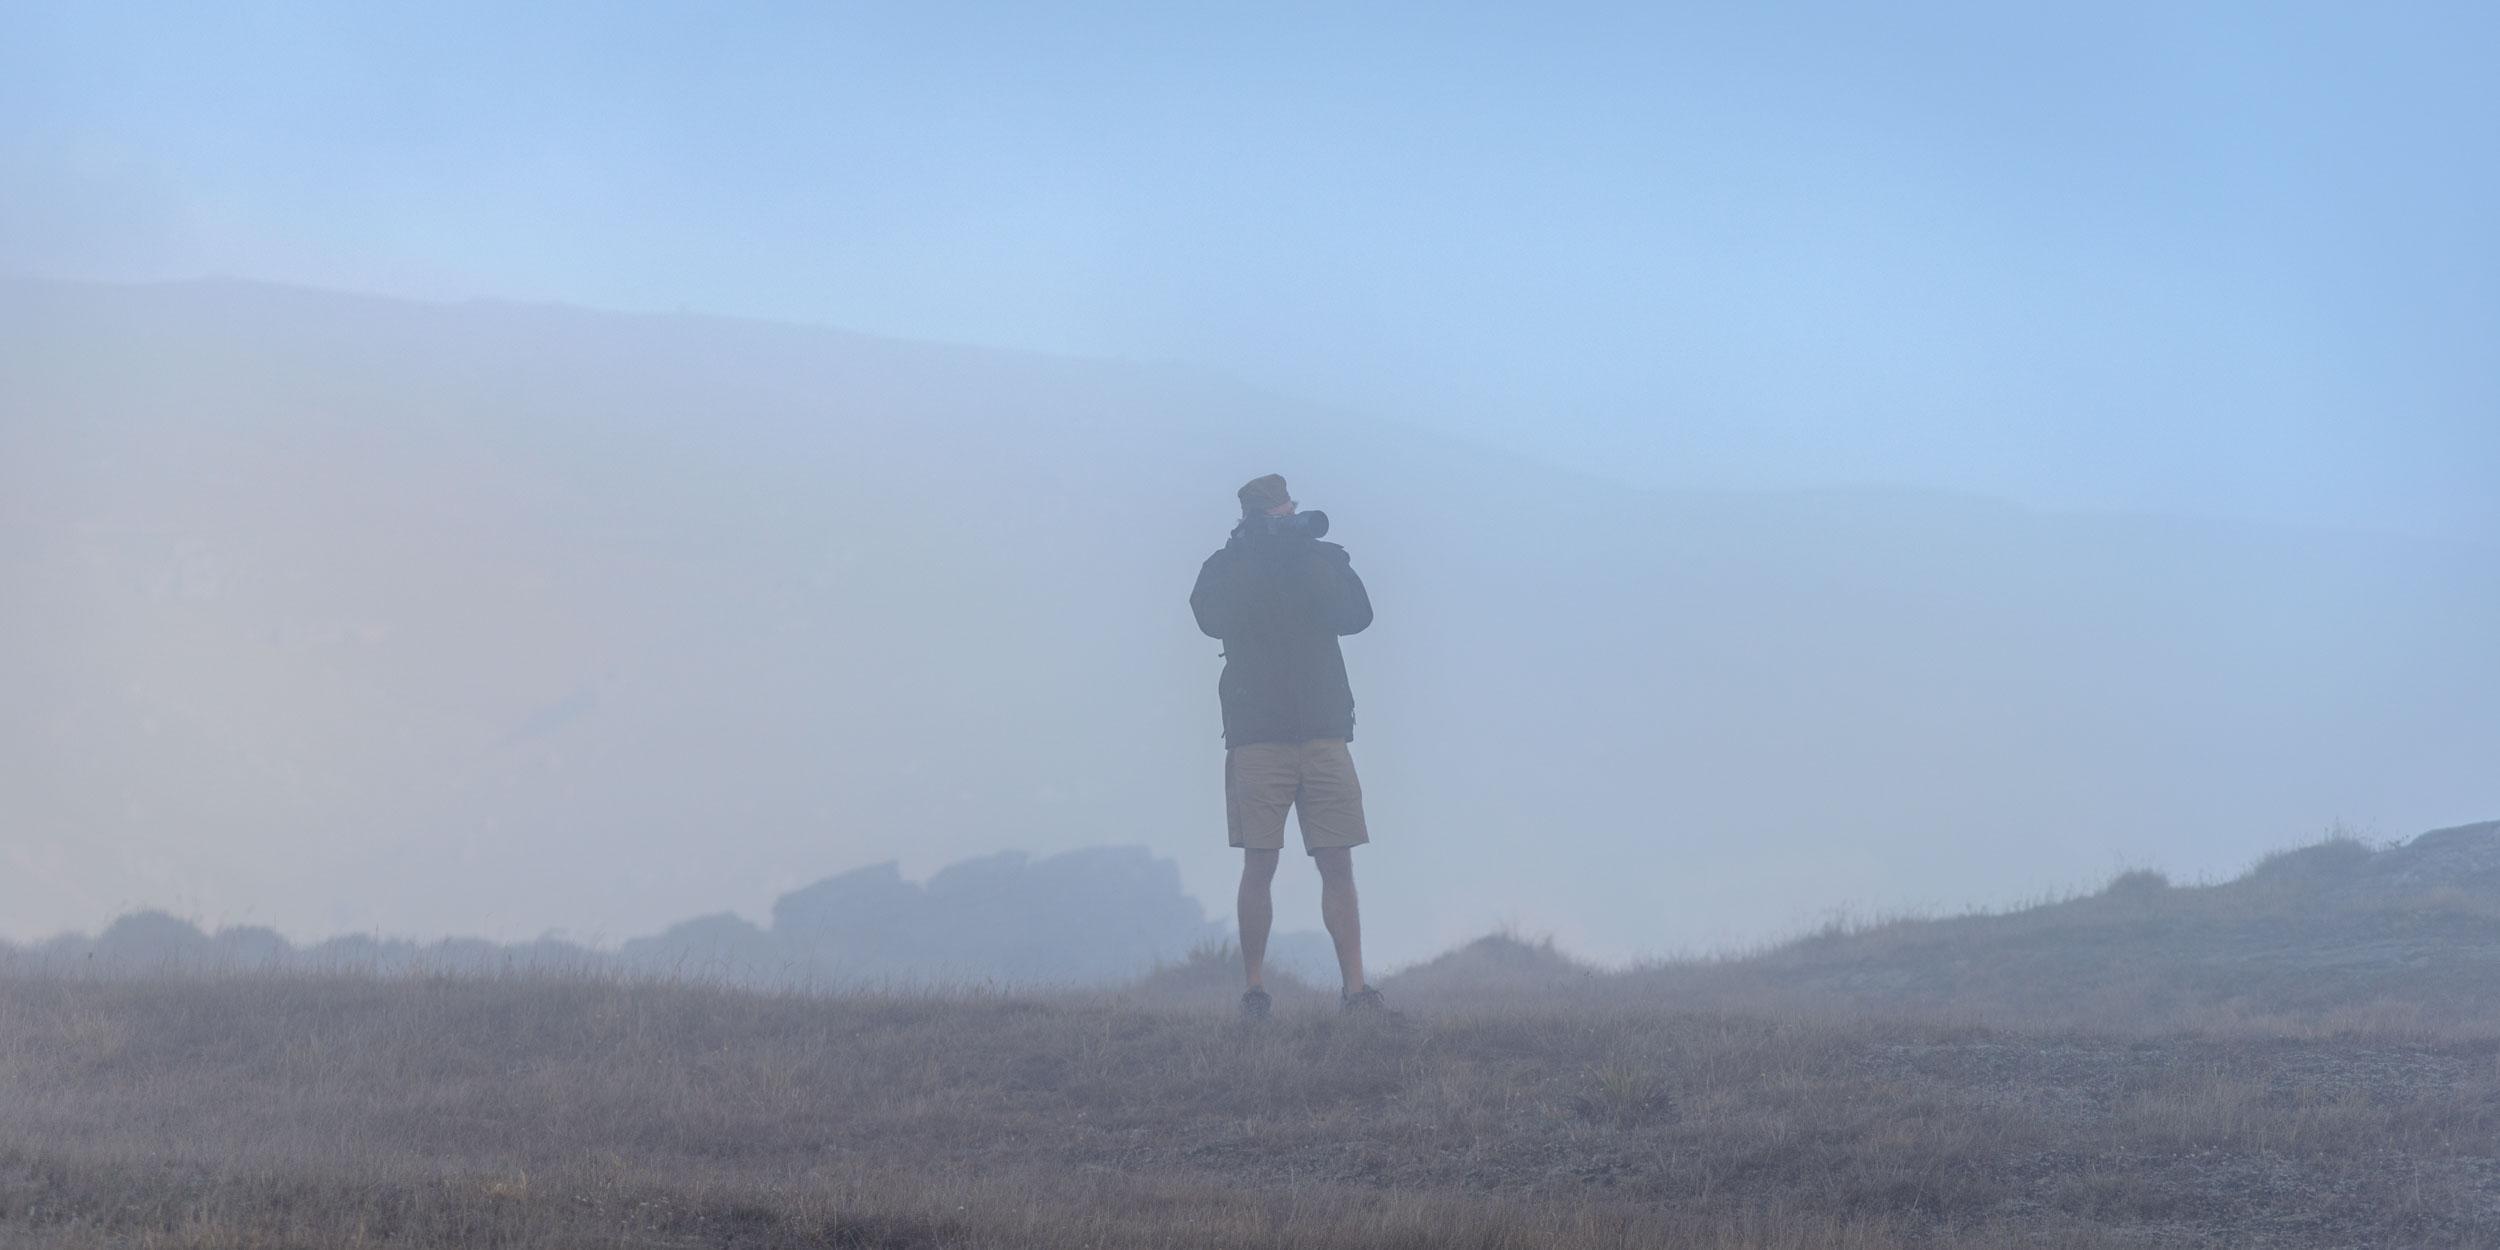 Fog rolls around photographer